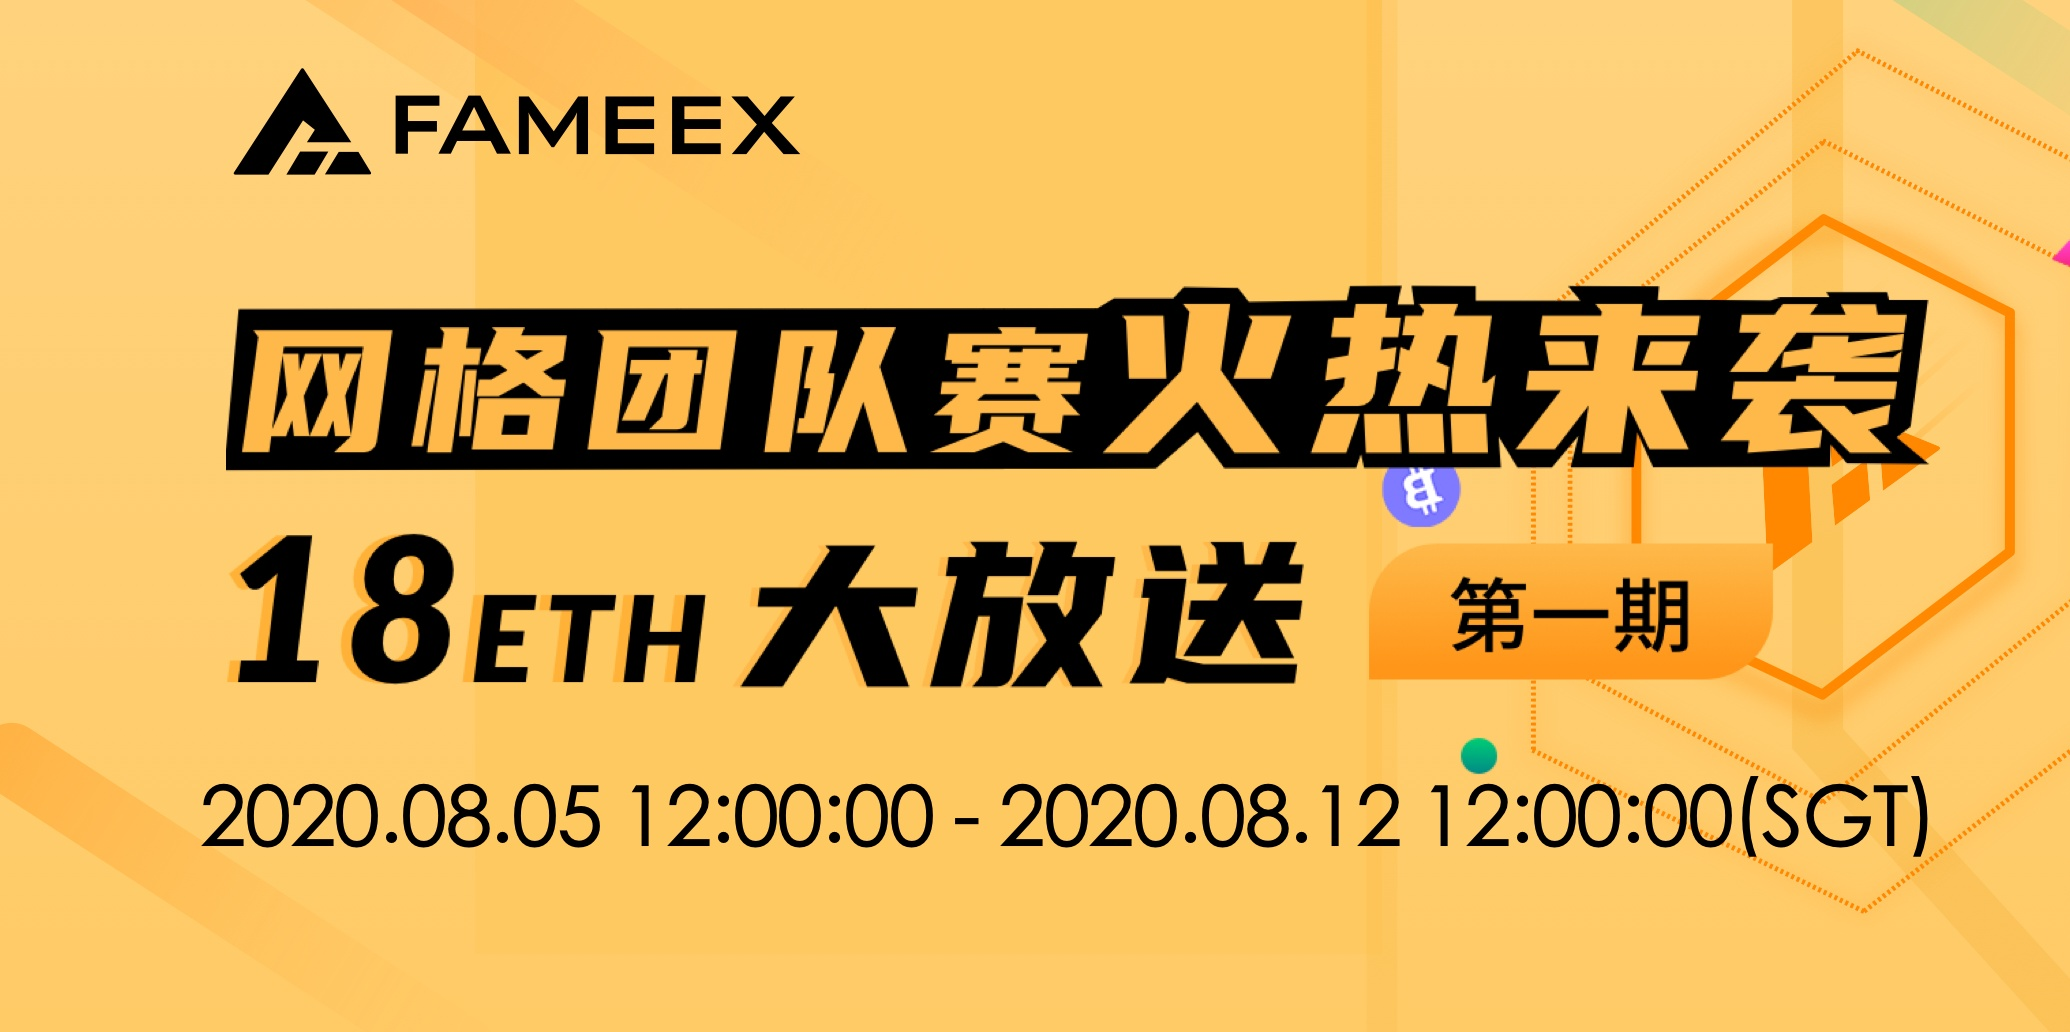 FAMEEX交易所与库神钱包达成战略合作